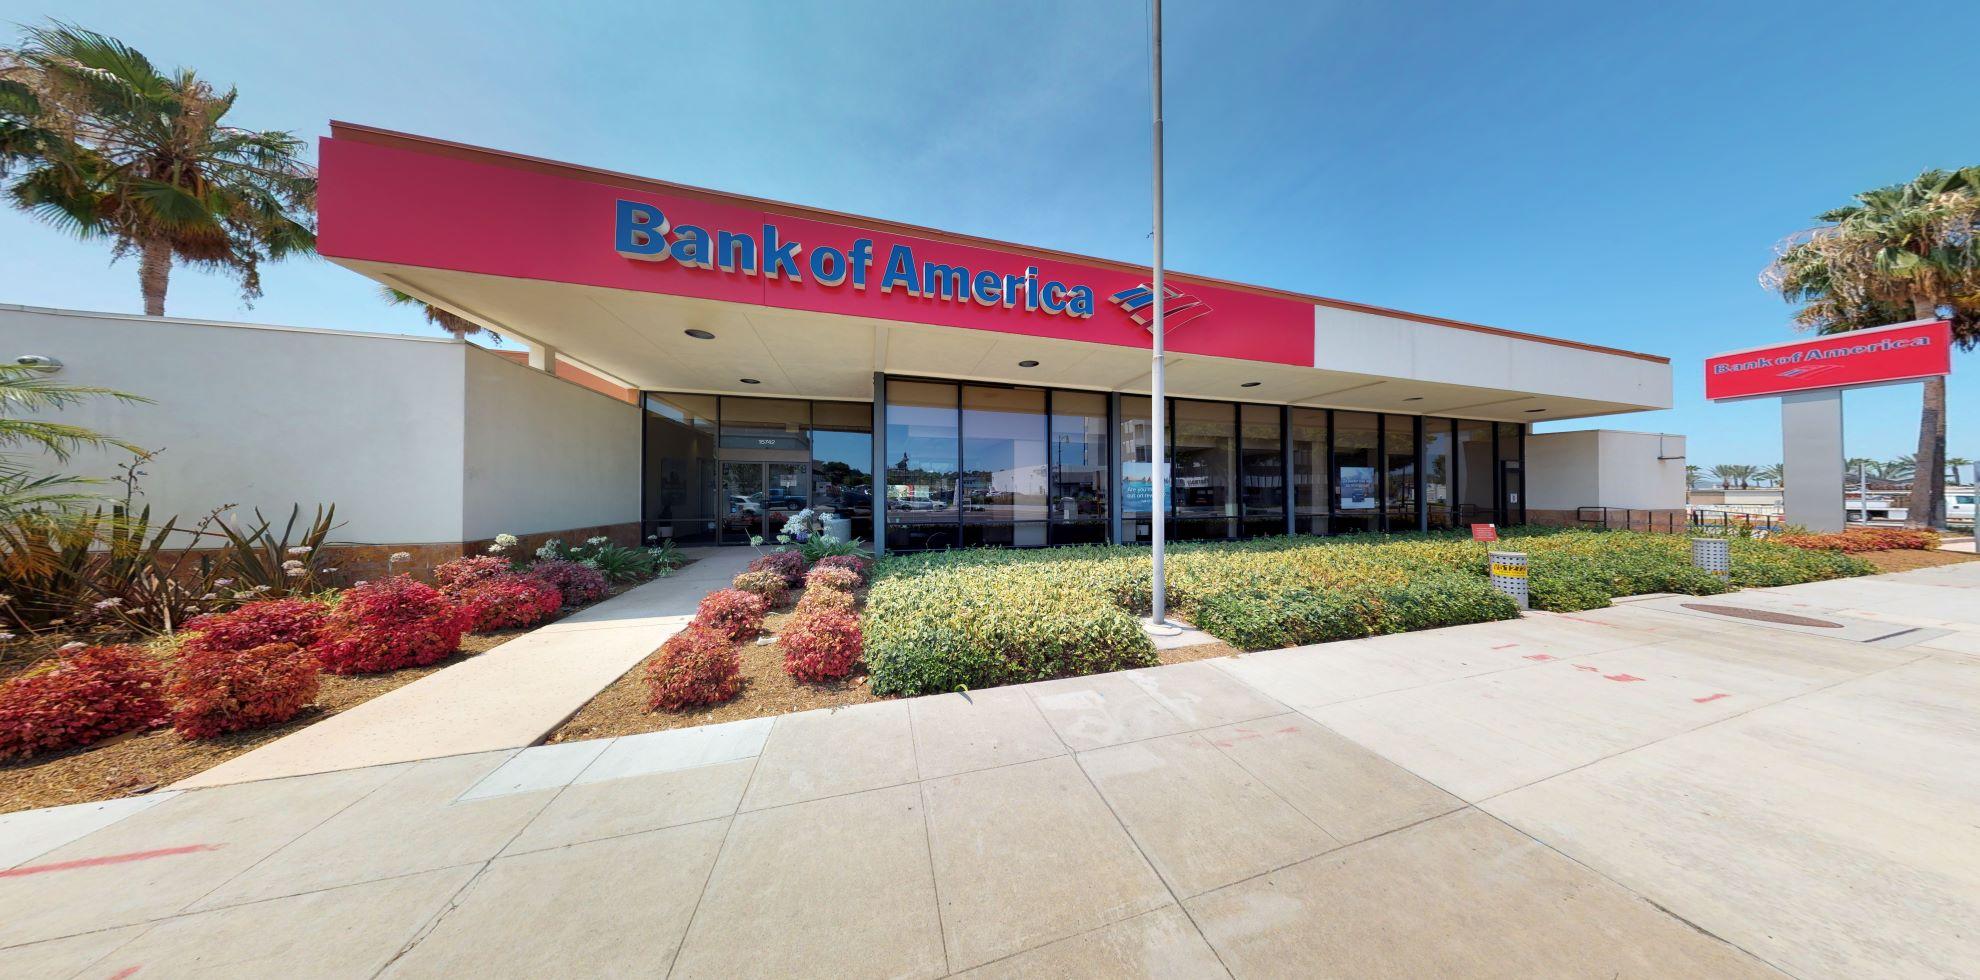 Bank of America financial center with drive-thru ATM | 15742 Whittier Blvd, Whittier, CA 90603